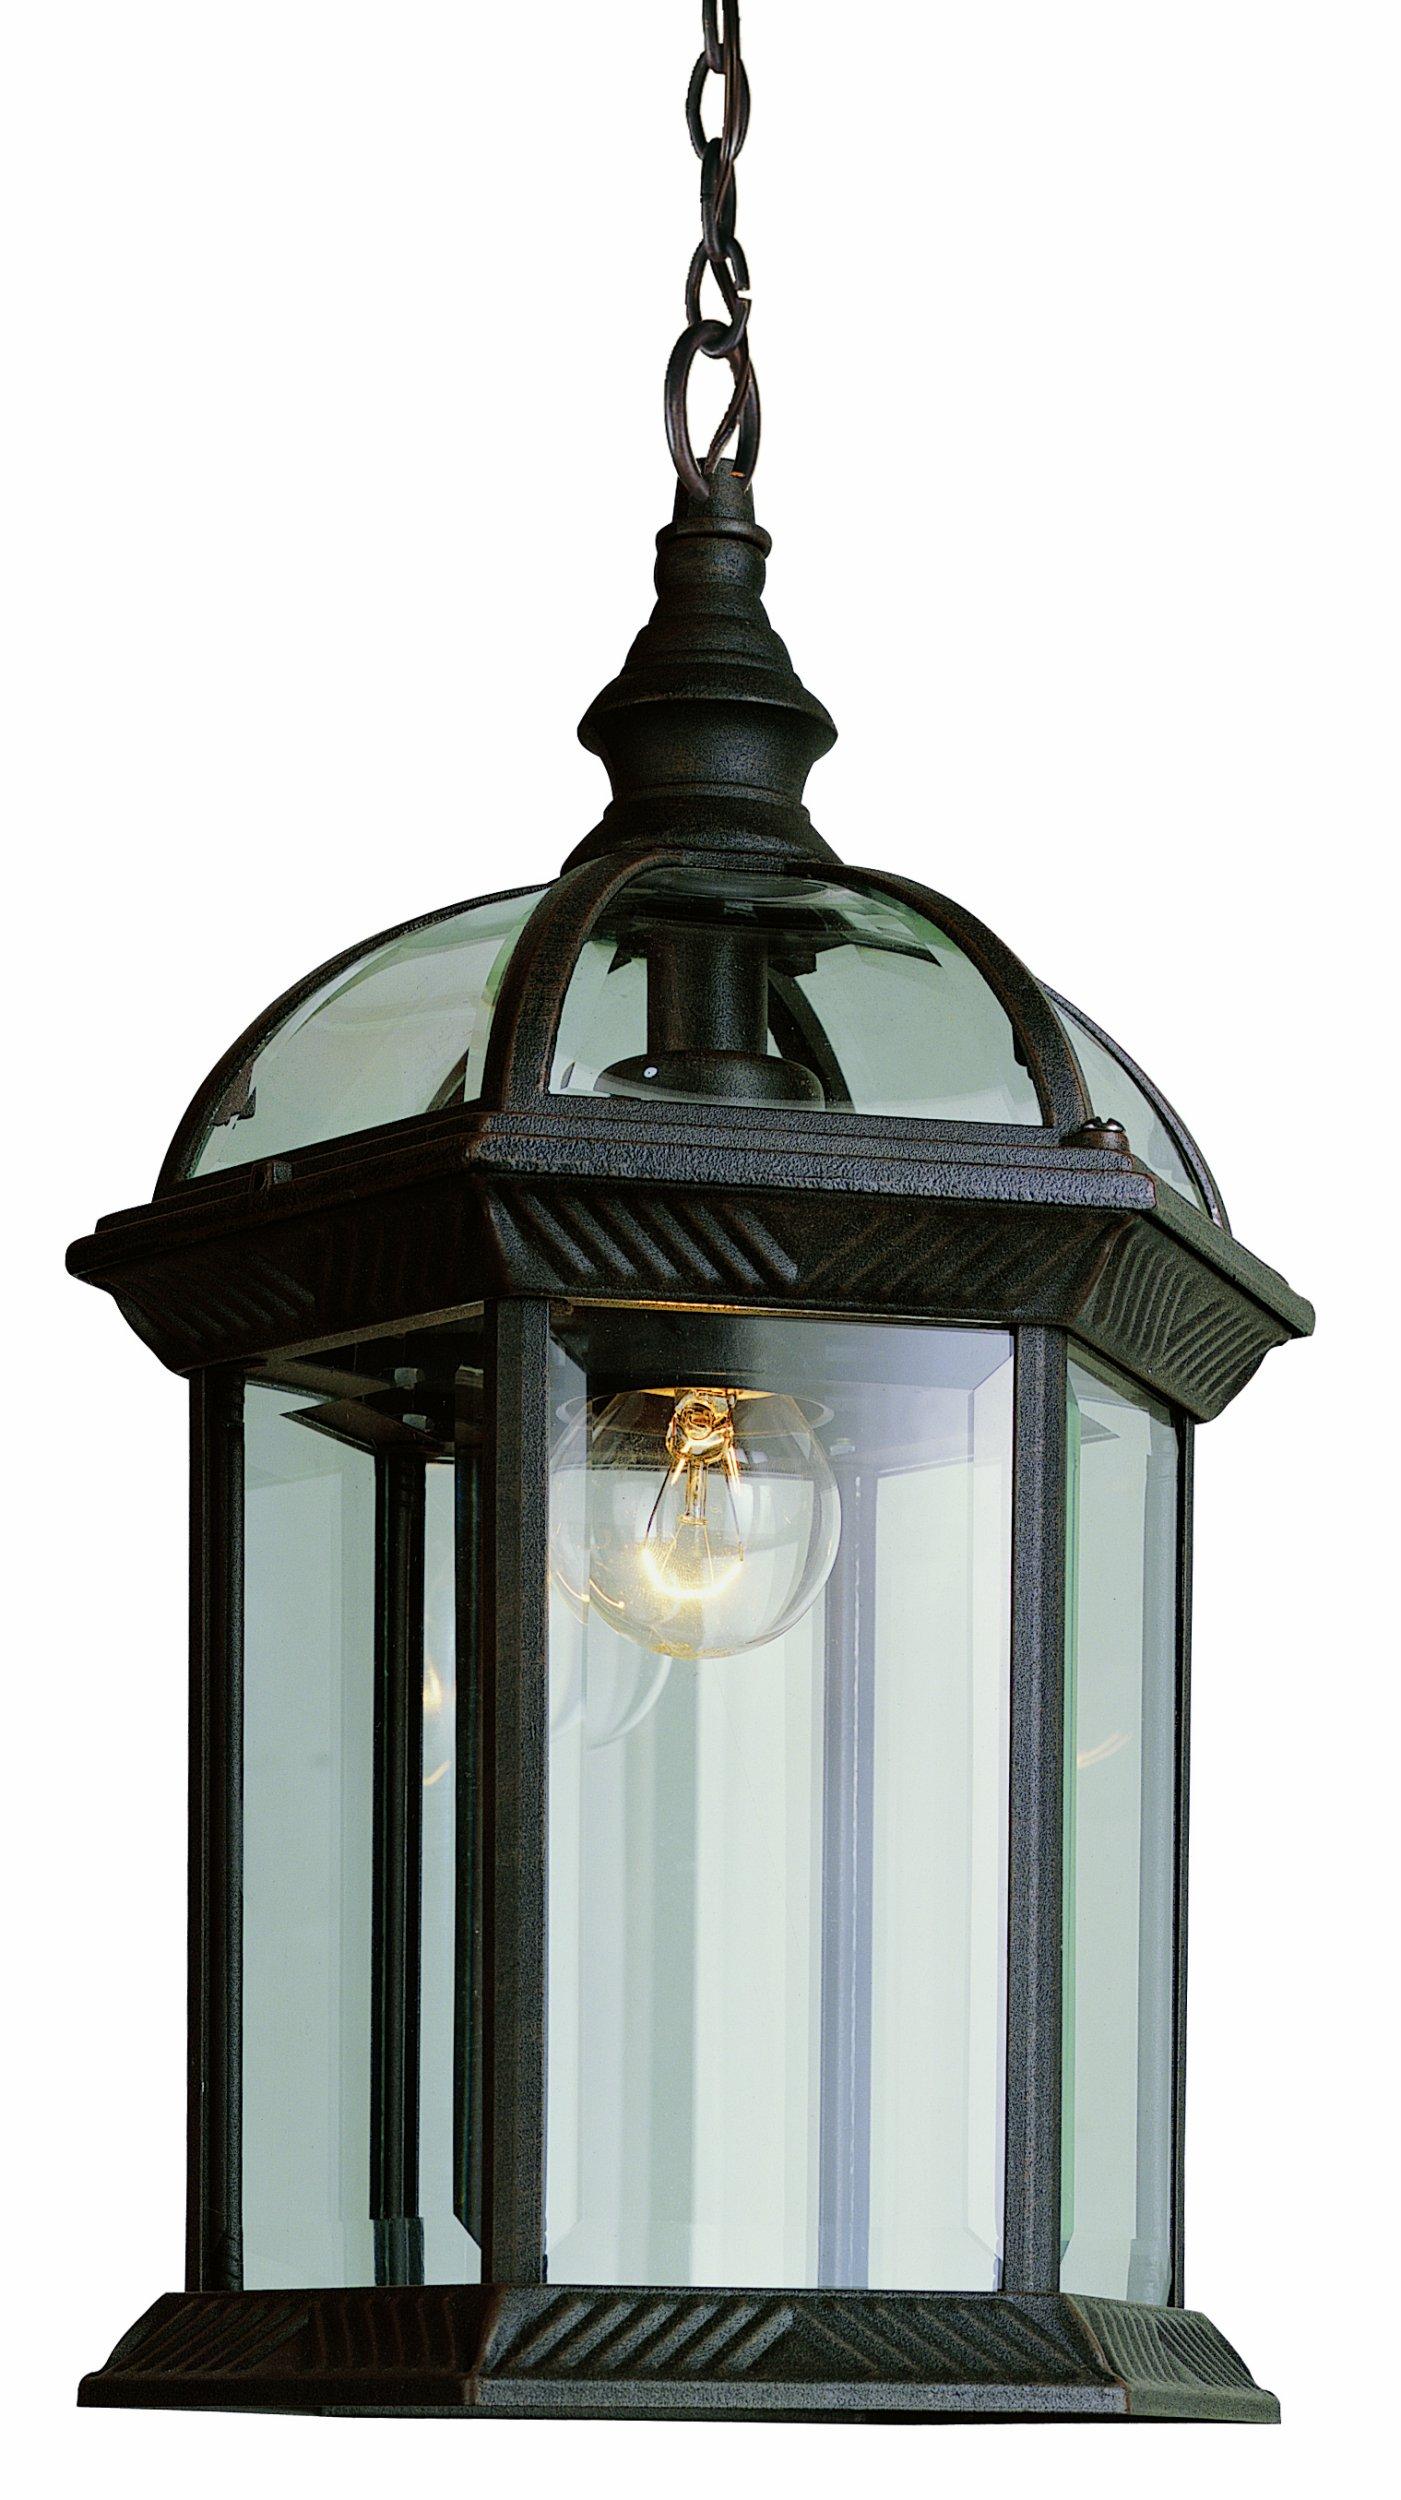 Trans Globe Lighting 4183 RT Outdoor Wentworth 17.5'' Hanging Lantern, Rust, 14-Inch, by Trans Globe Lighting